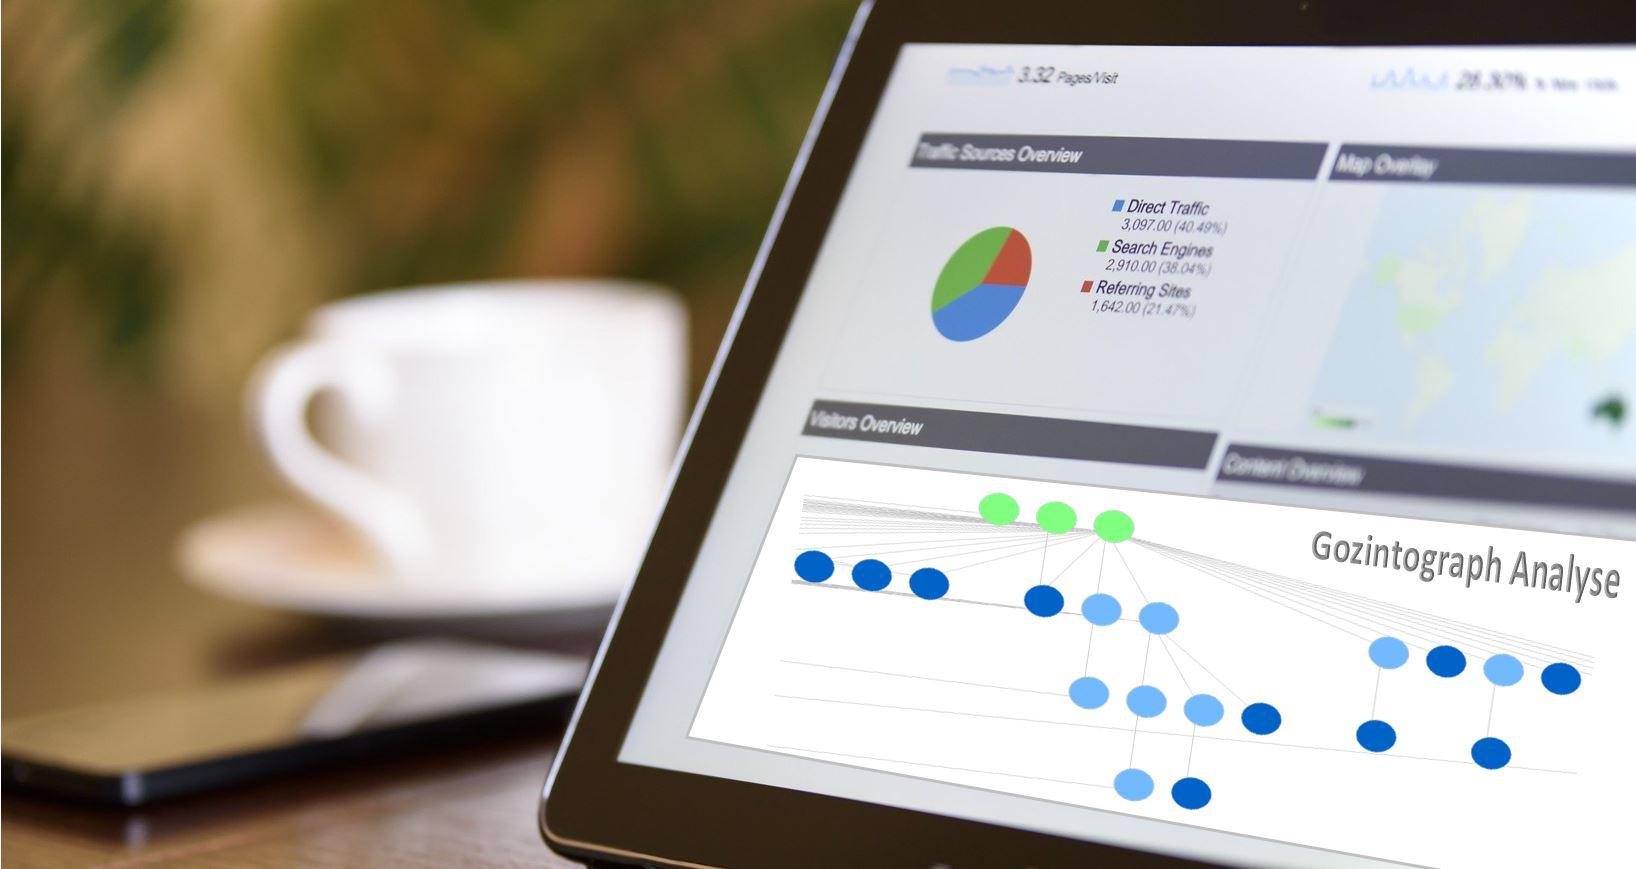 You are currently viewing Produktstruktur analysieren mit Gozintograph Viewer